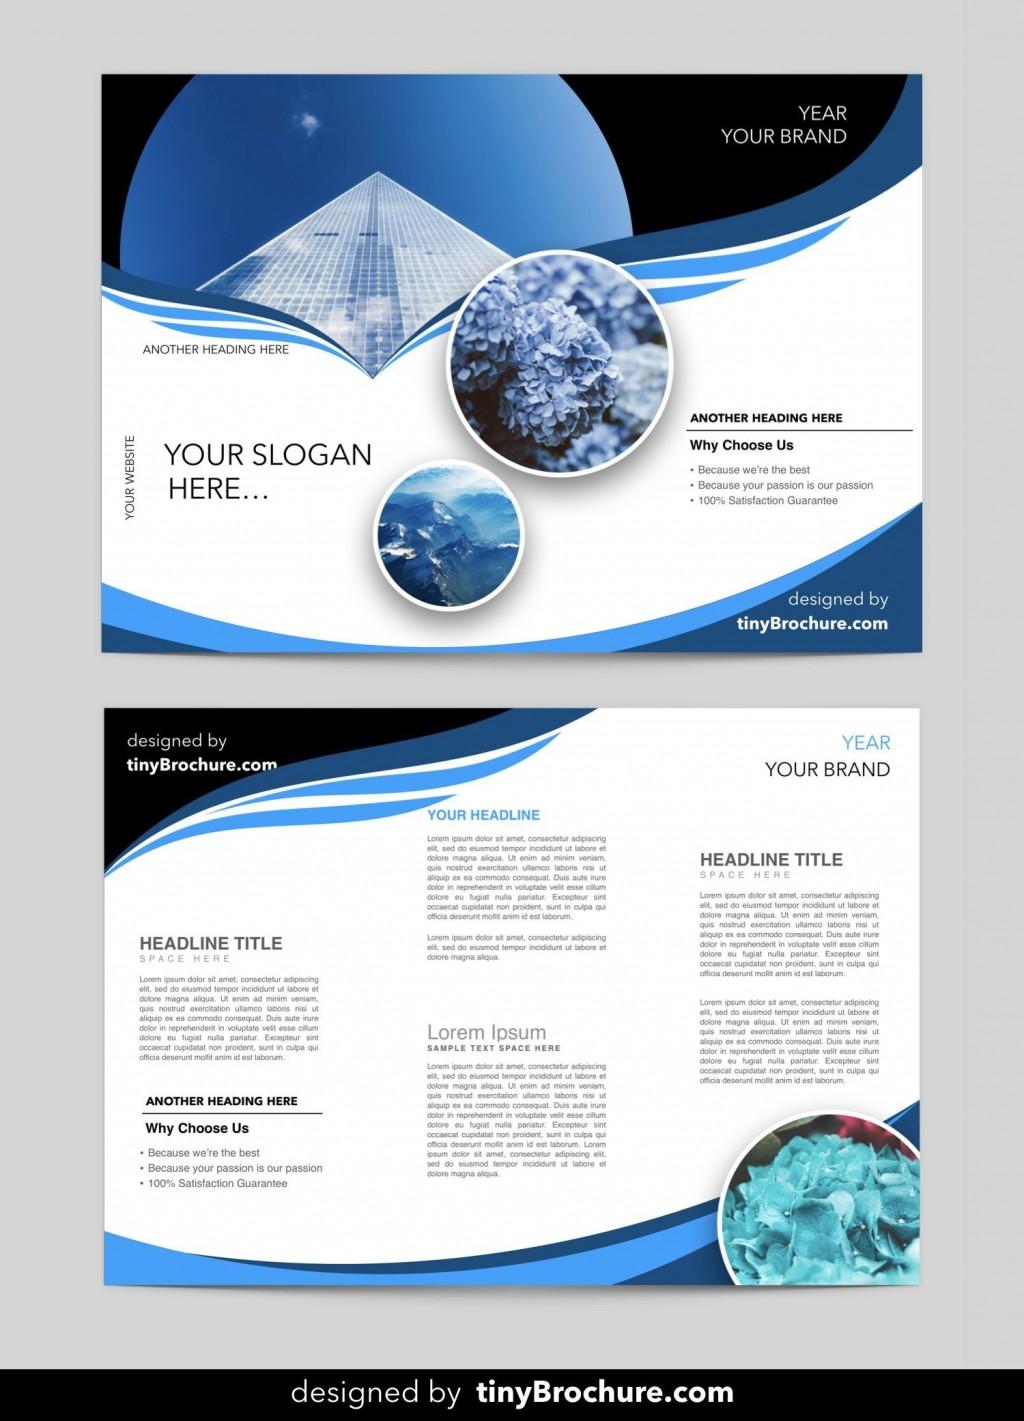 000 Formidable Brochure Layout M Word Sample  Microsoft Funeral TemplateLarge